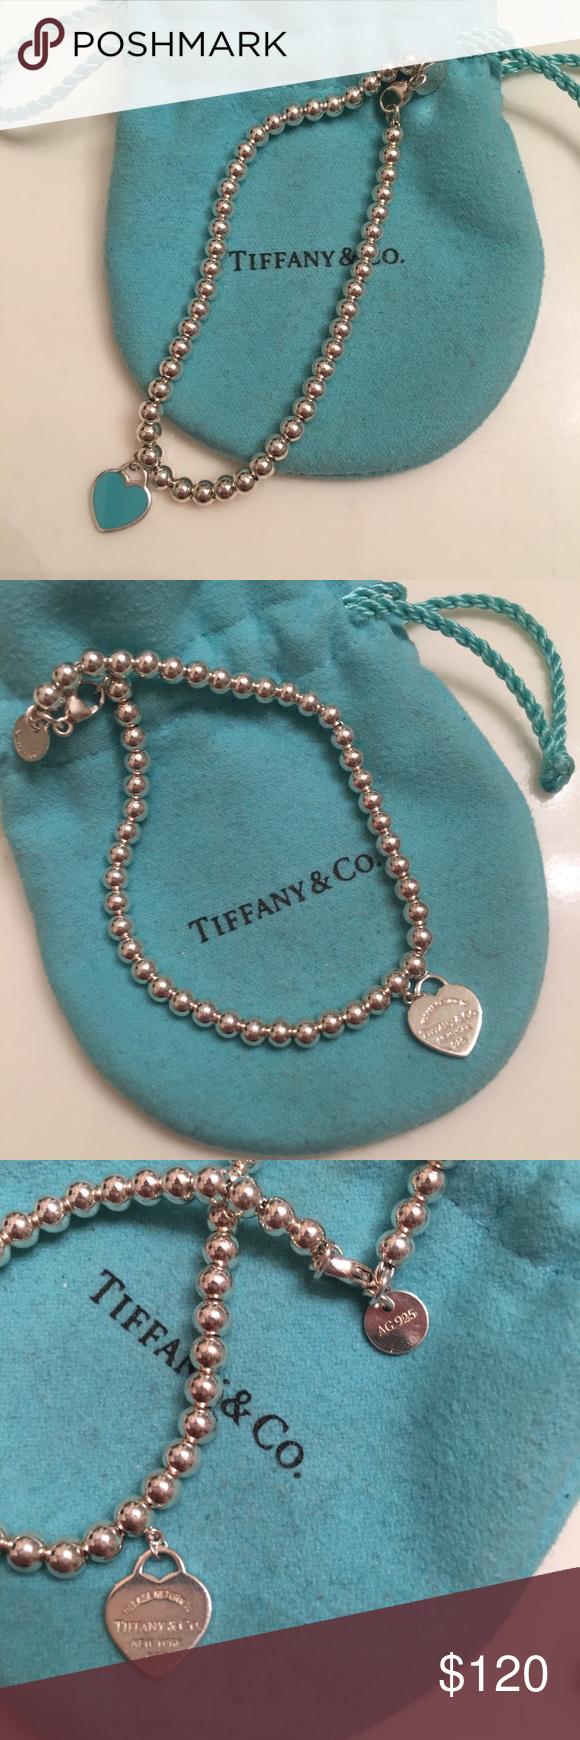 b6bfc5ecb Tiffany & Co Bead Bracelet Warn once- Sterling silver tag with Tiffany  Blue® enamel finish On a bead bracelet 7.5